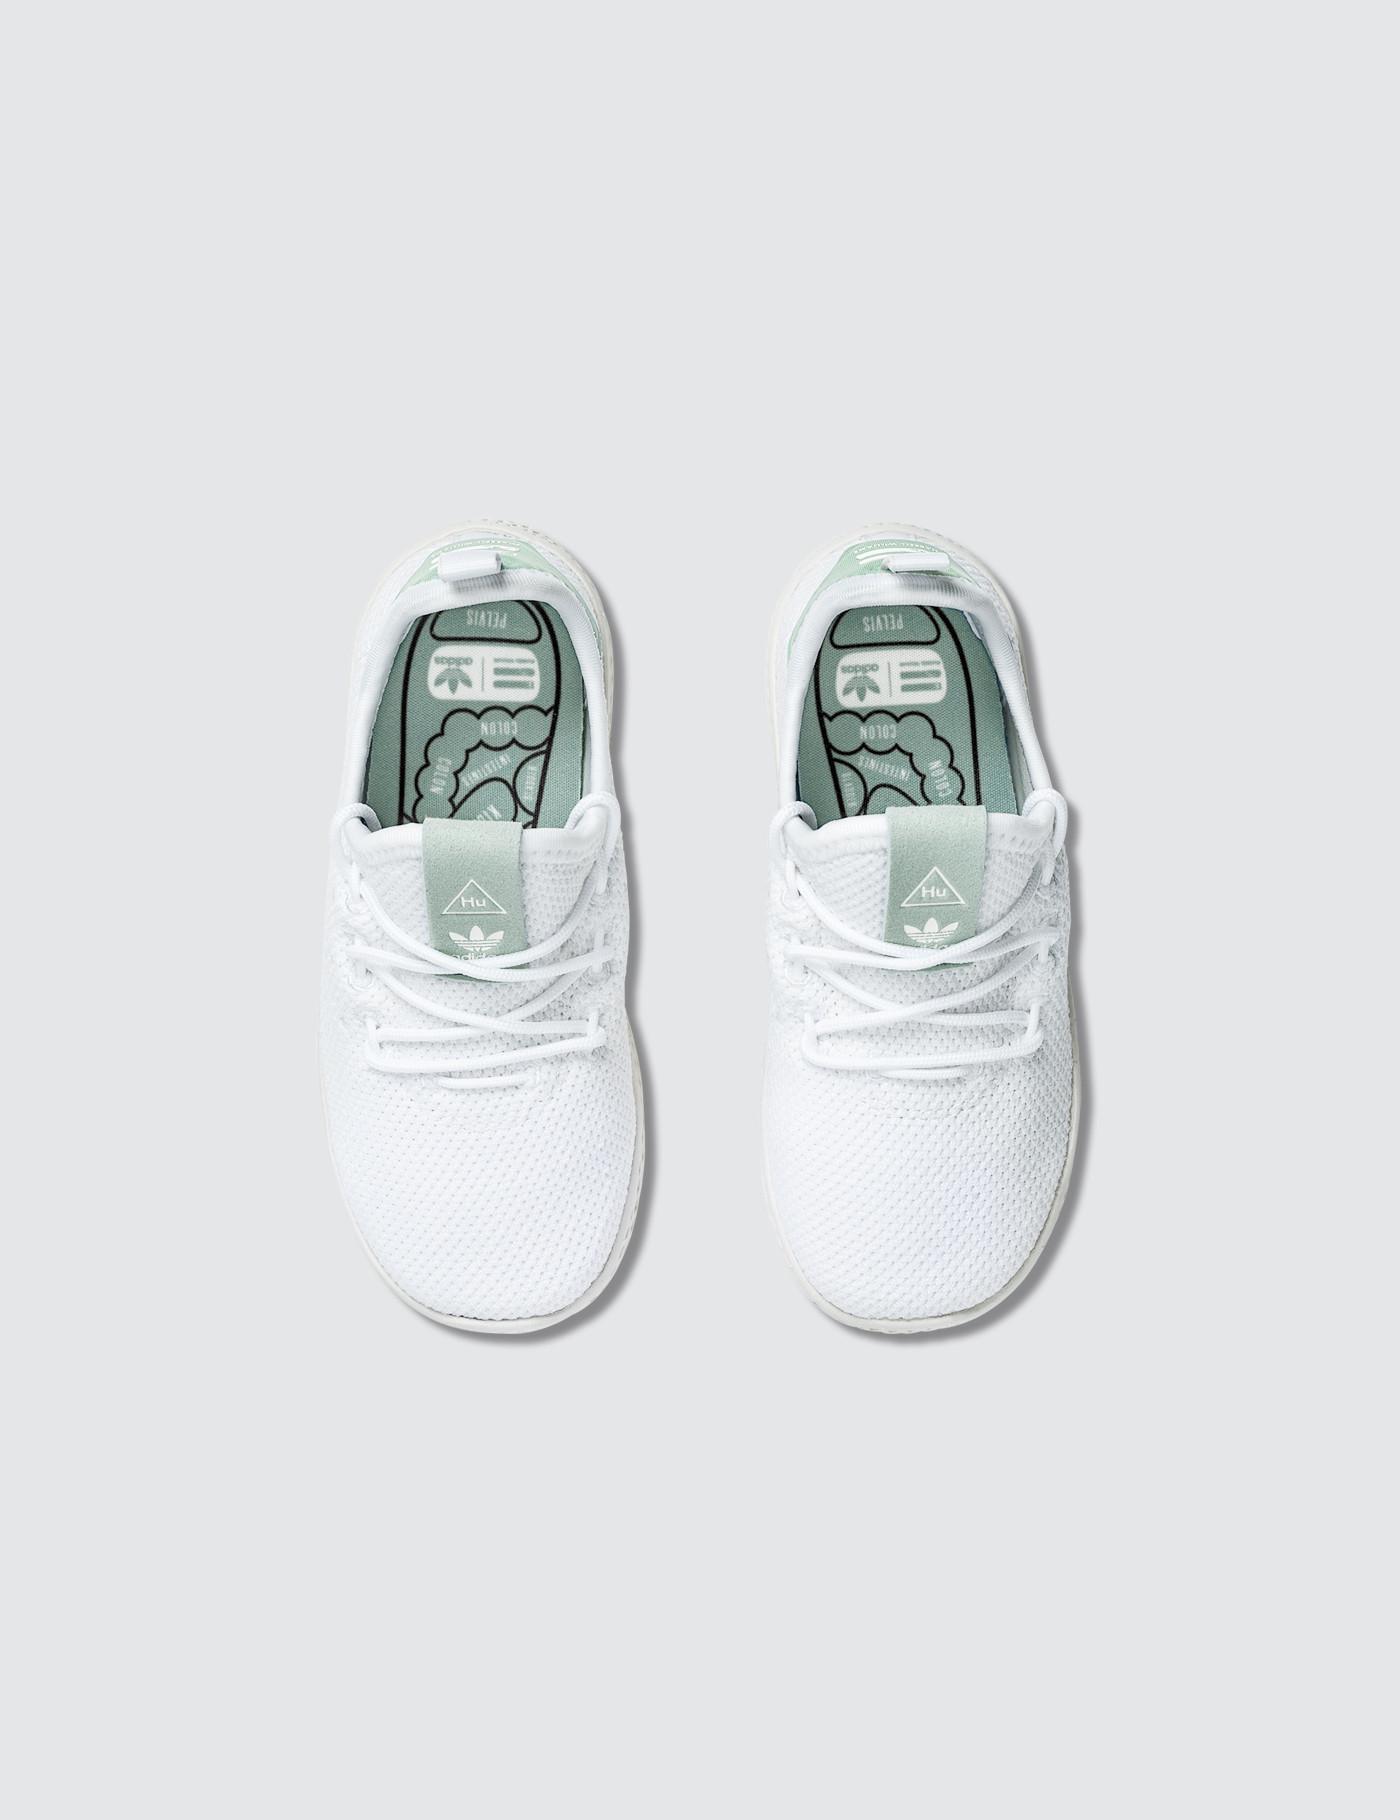 258c7b56056e2 Lyst - adidas Originals Pharrell Williams X Adidas Pw Tennis Hu Infants in  White for Men